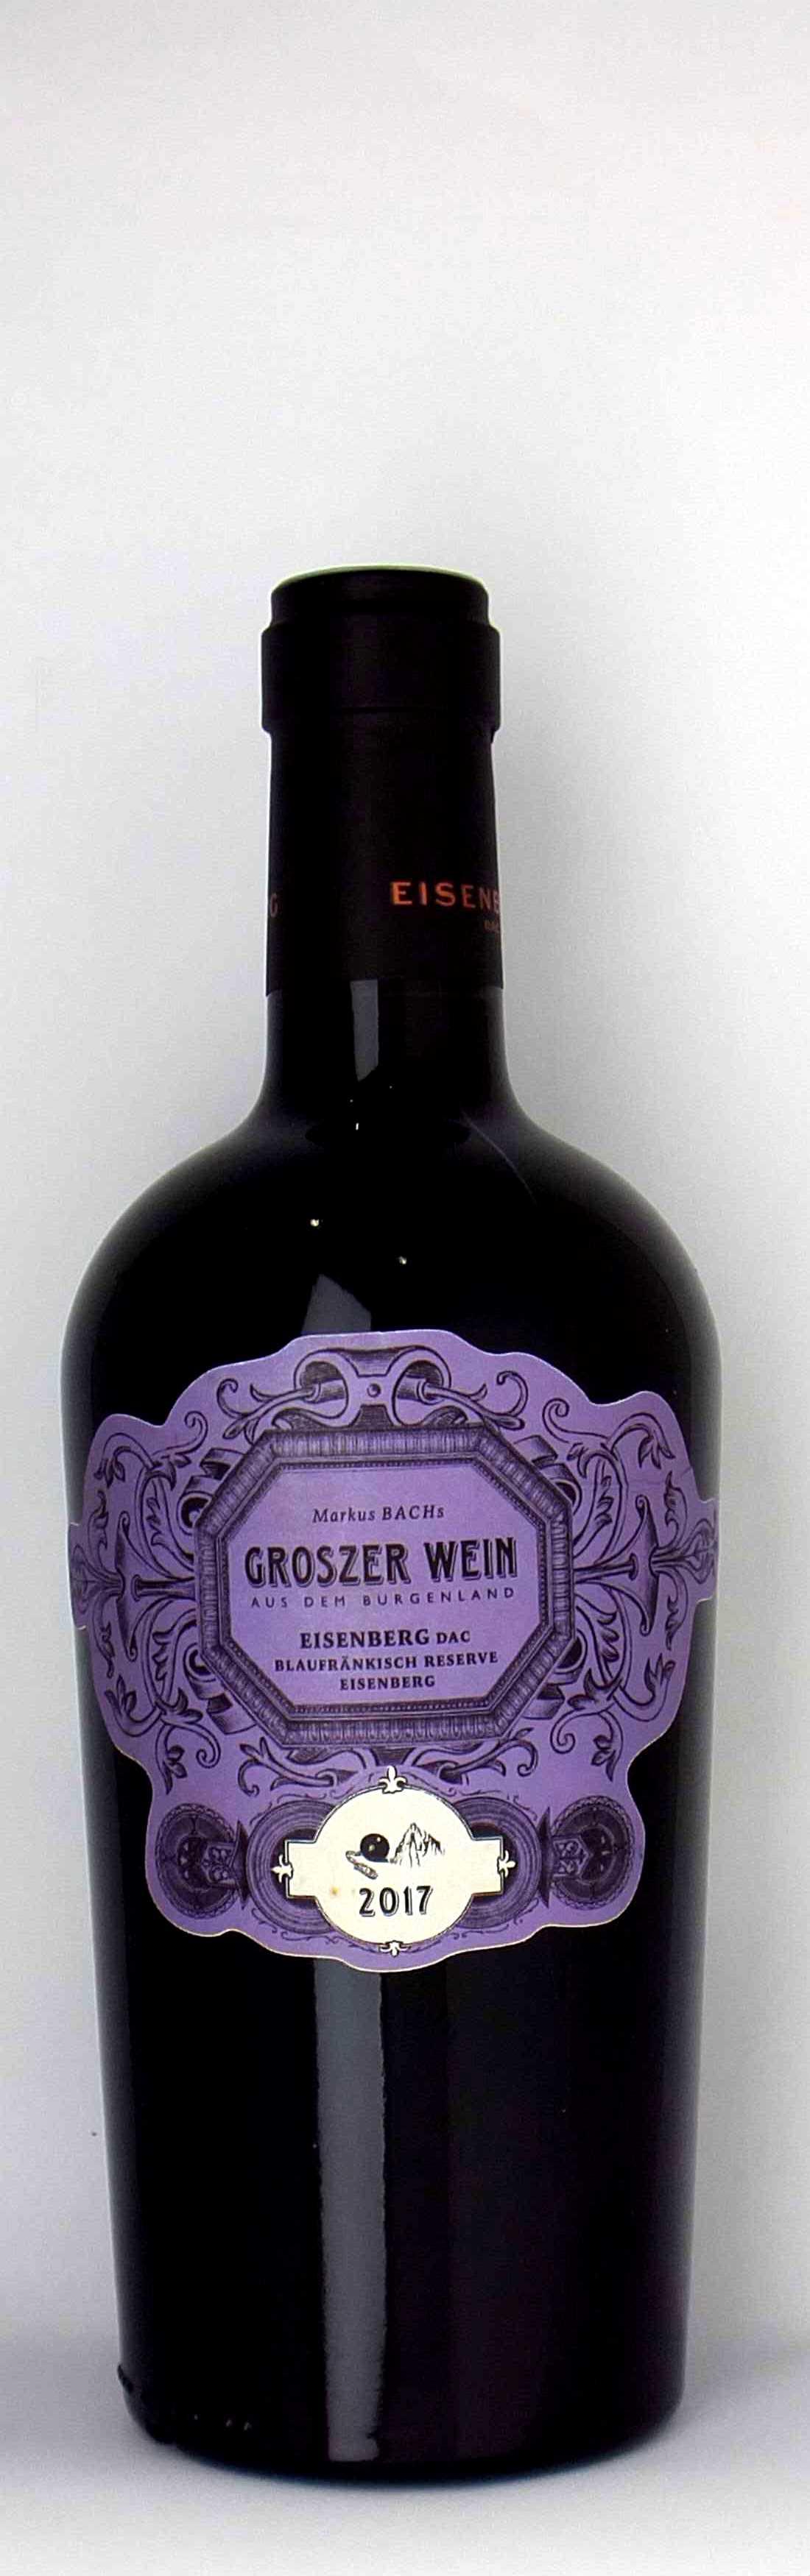 Vinothek Eisenberg Eisenberg DAC Reserve Eisenberg 2017 Groszer Wein